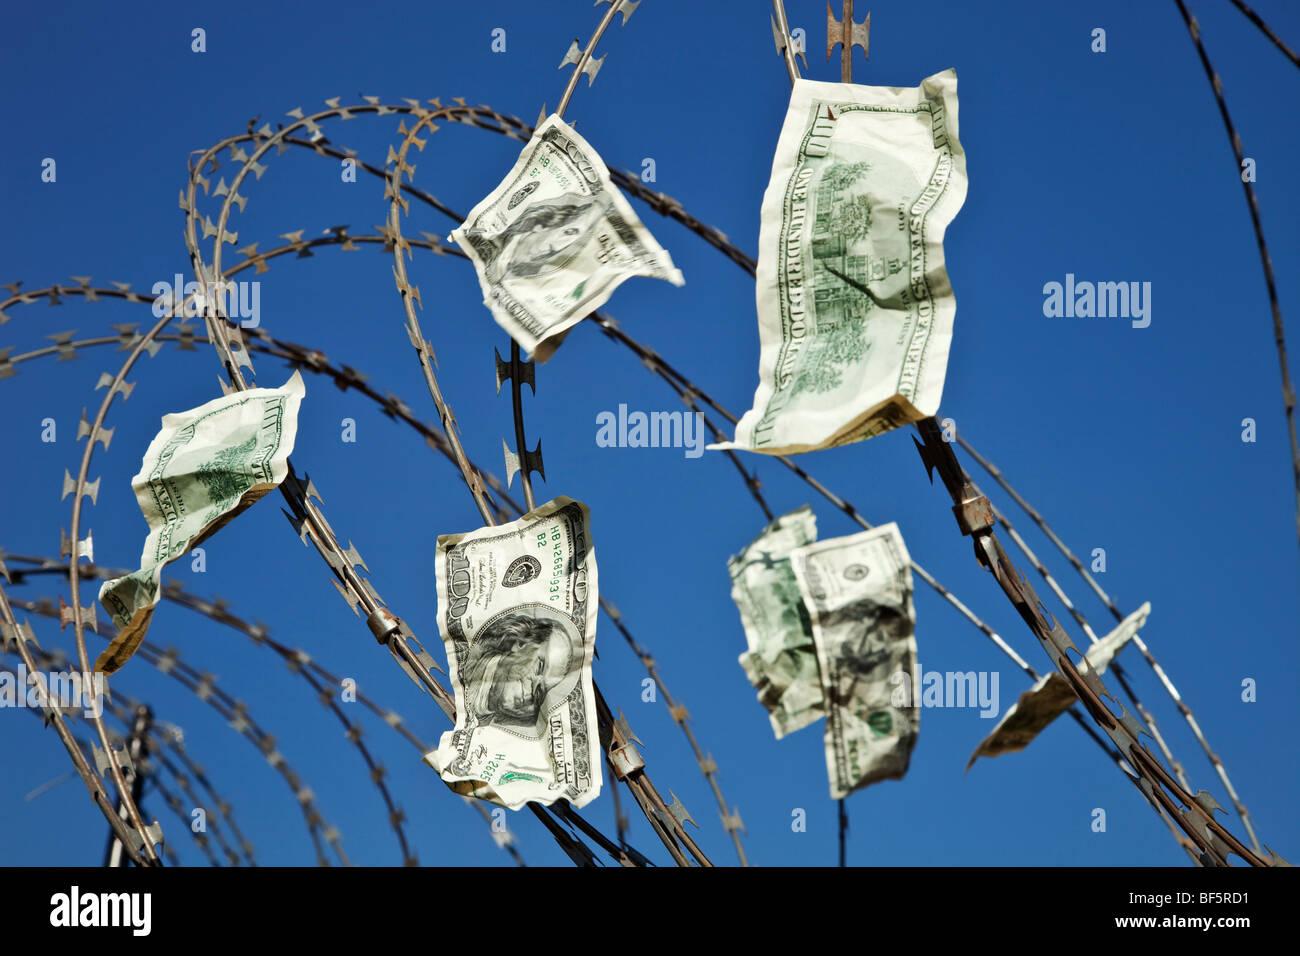 Hundred dollar bills. - Stock Image